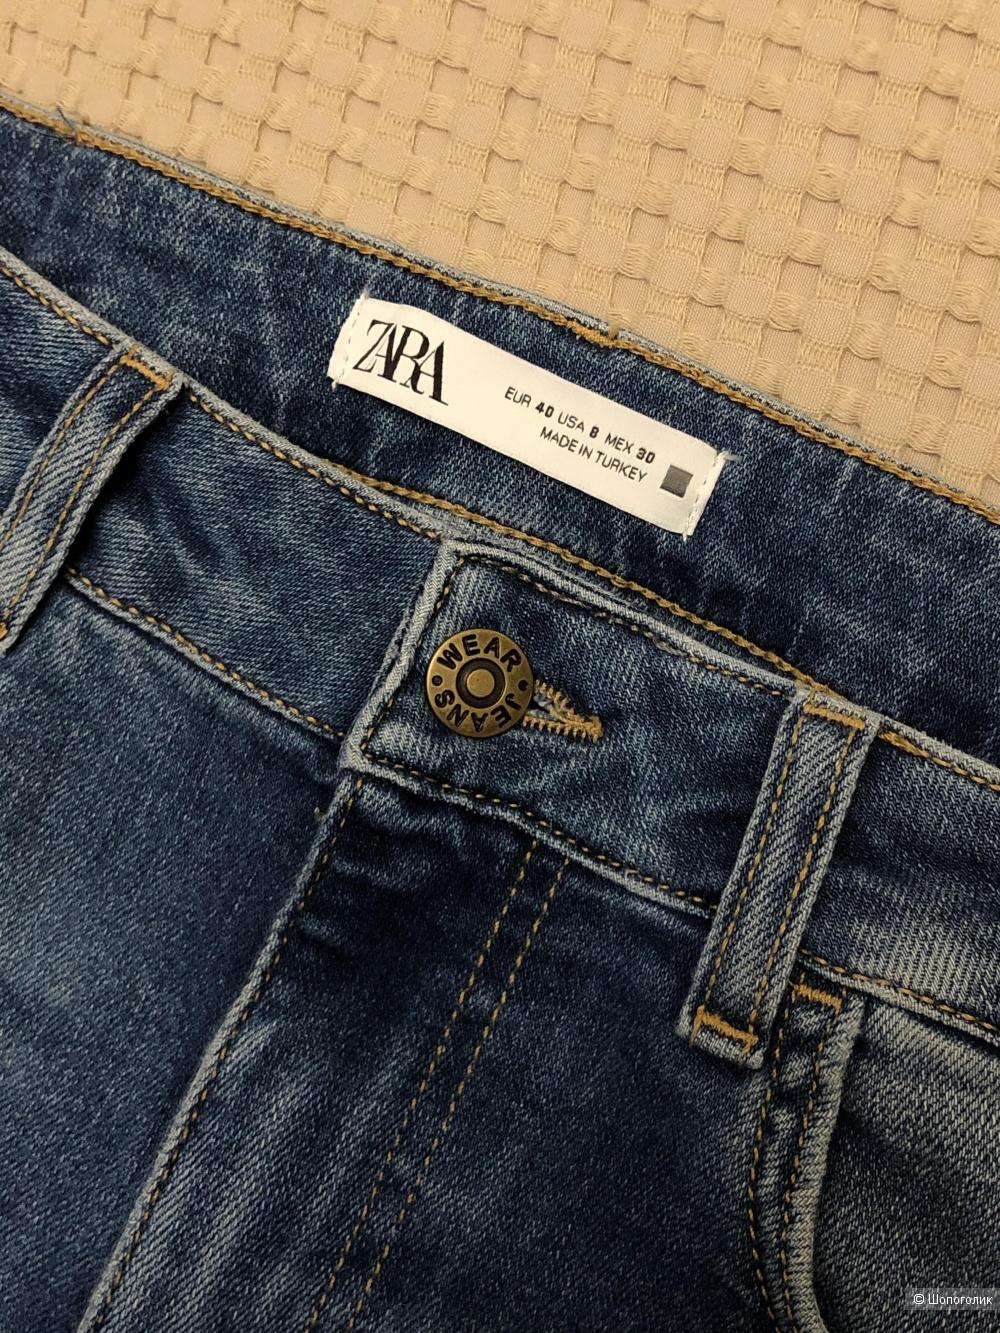 Джинсы Zara, размер 30